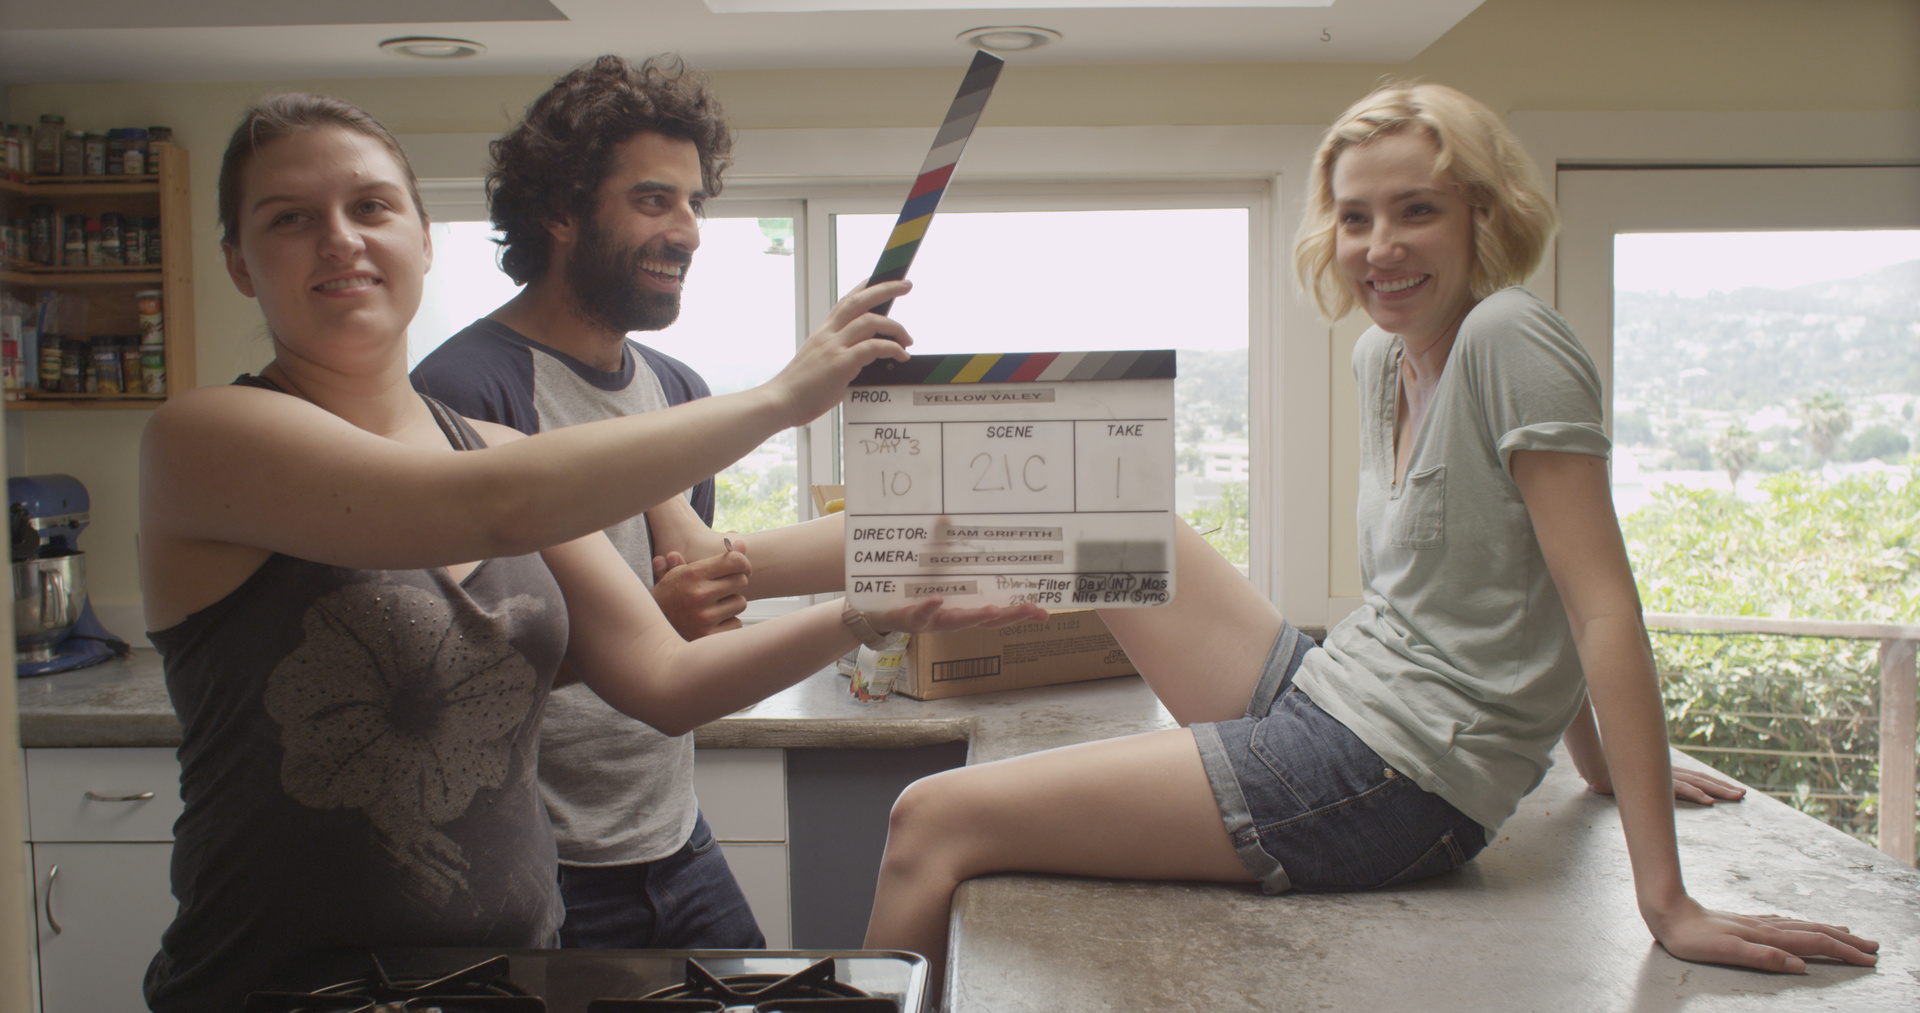 Jenni Melear and Karim Saleh behind the scenes, Yellow Valley